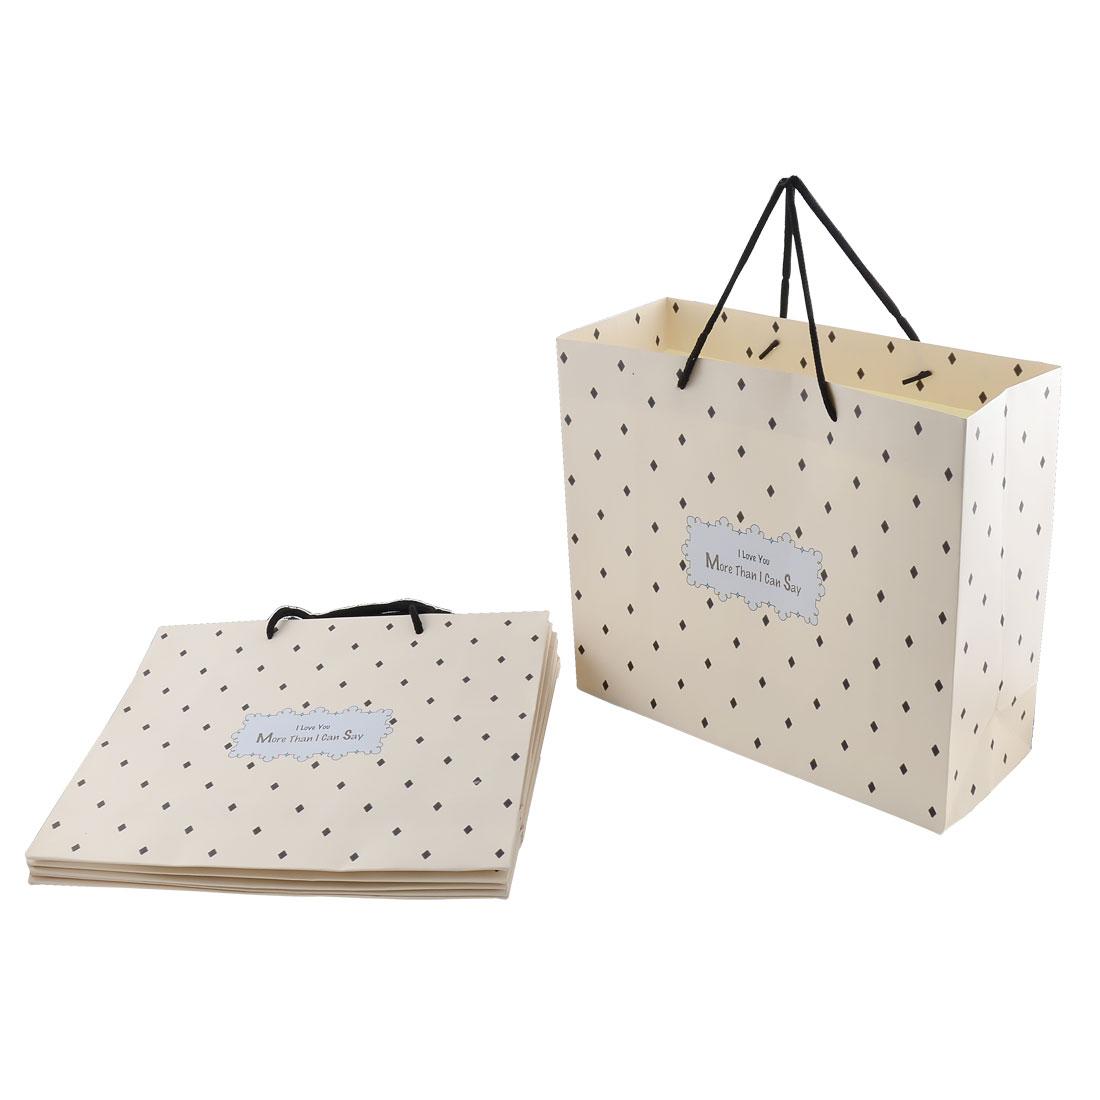 Paper Rhombus Pattern Shopping Wedding Gift Bags Holder Off White 6pcs